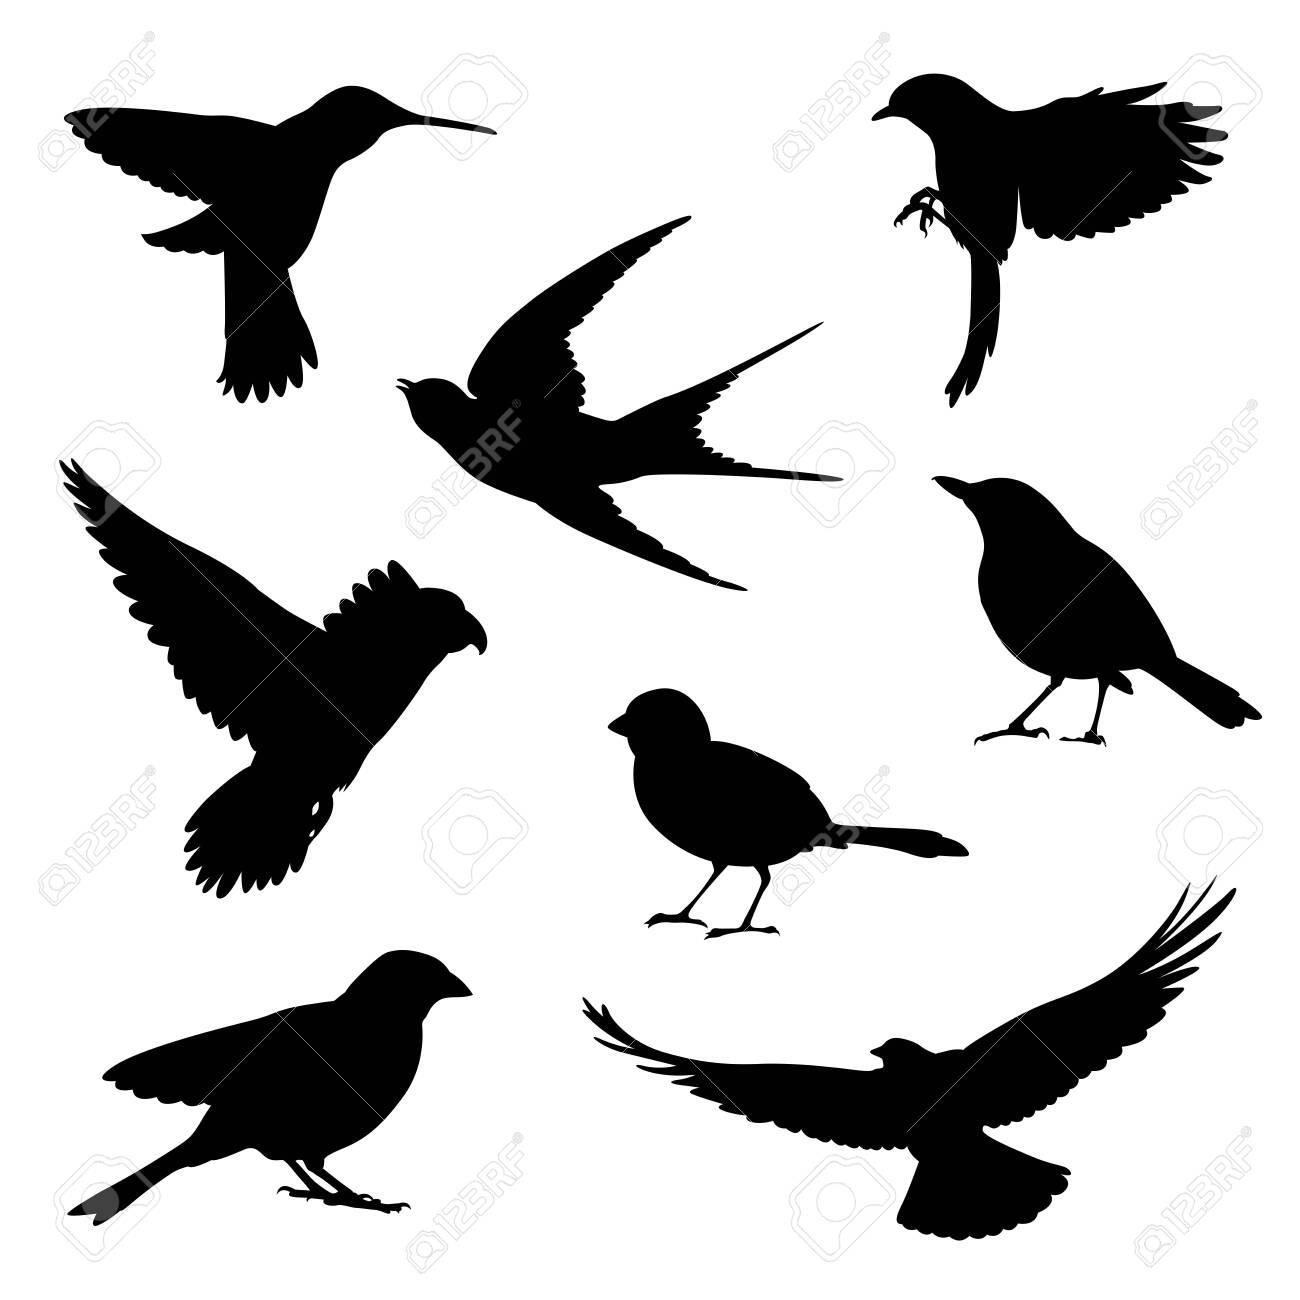 bird silhouette illustration set - 131377045